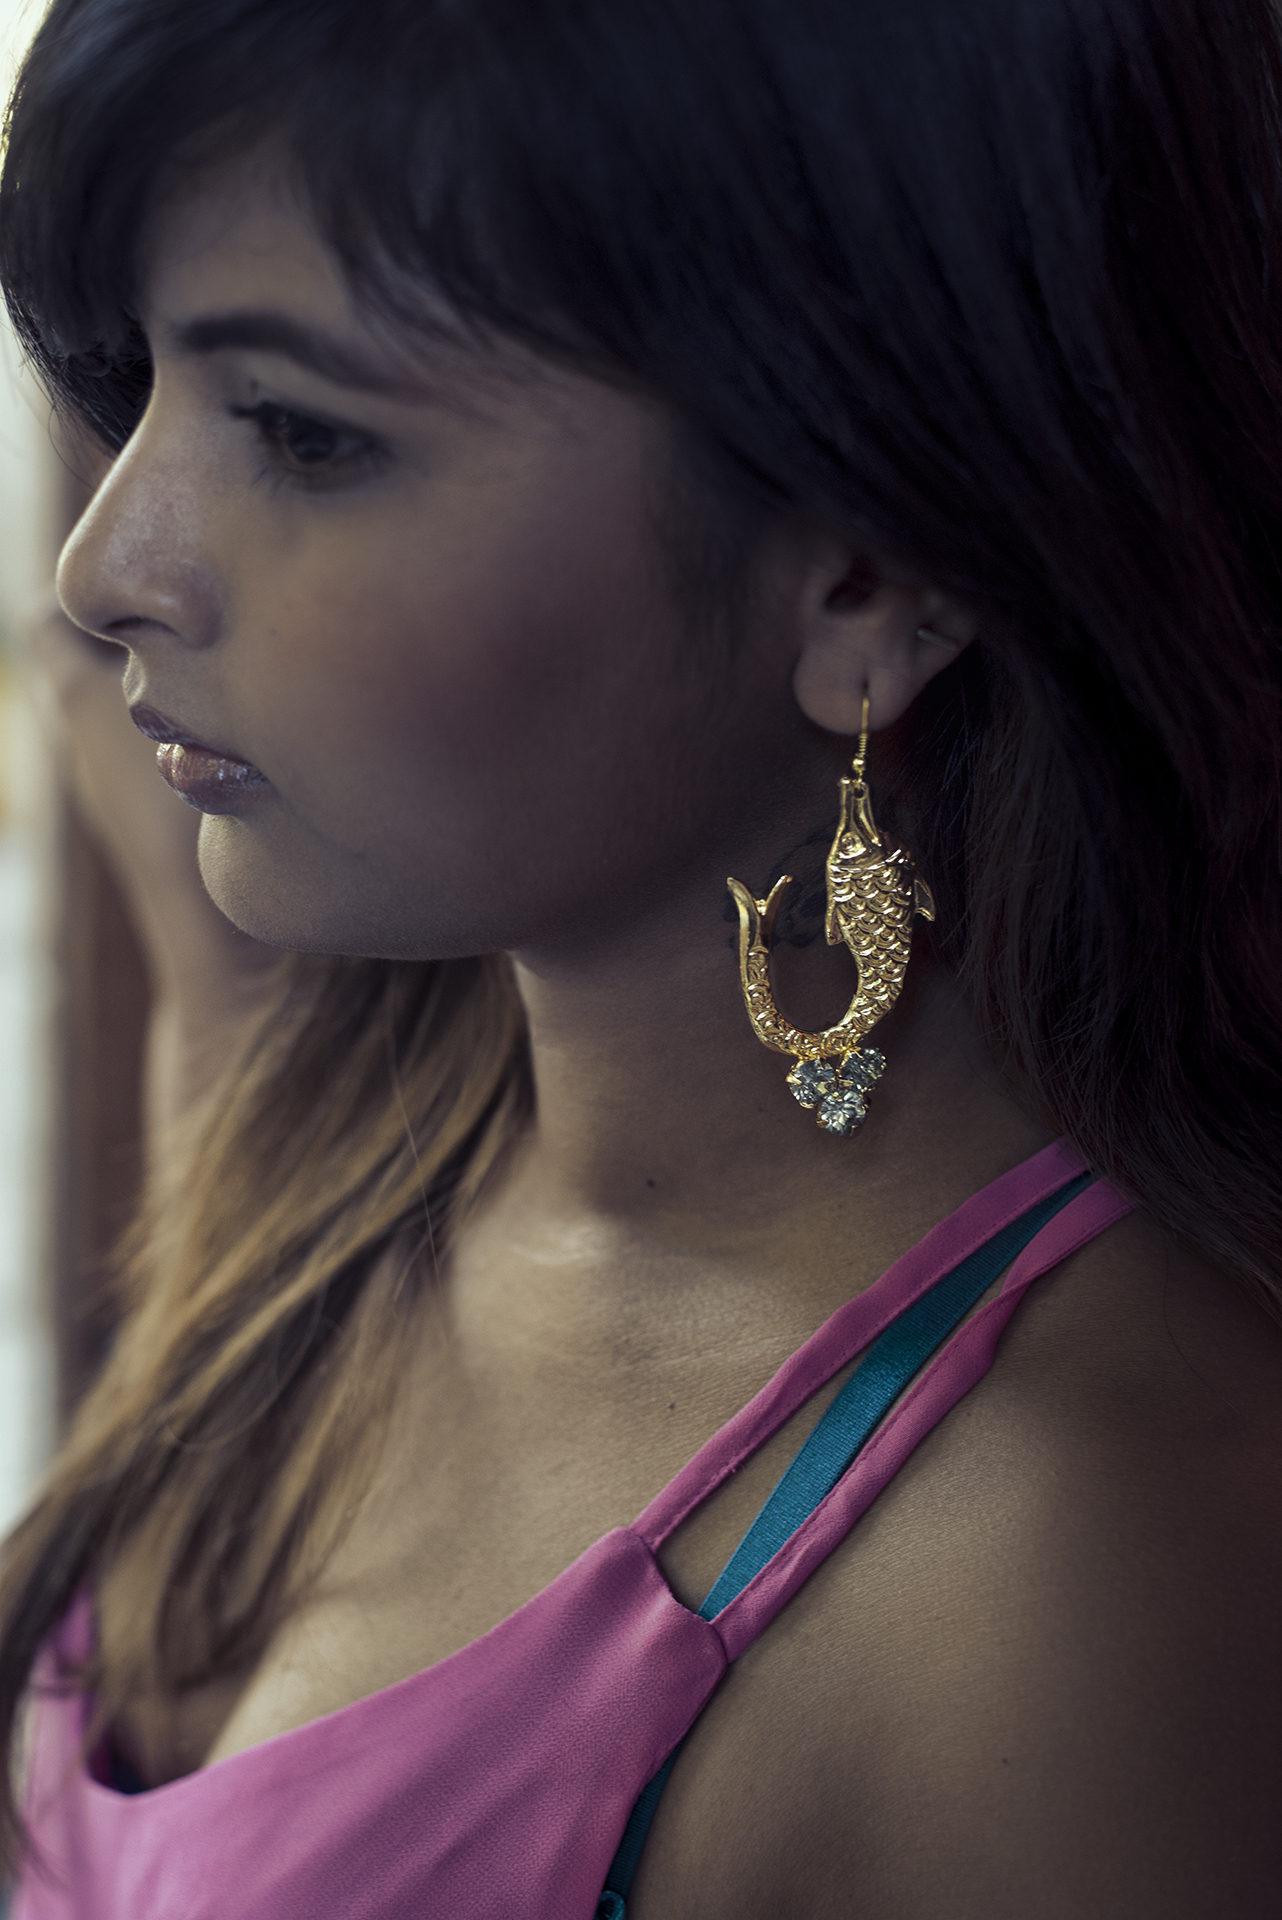 Ornamas earring